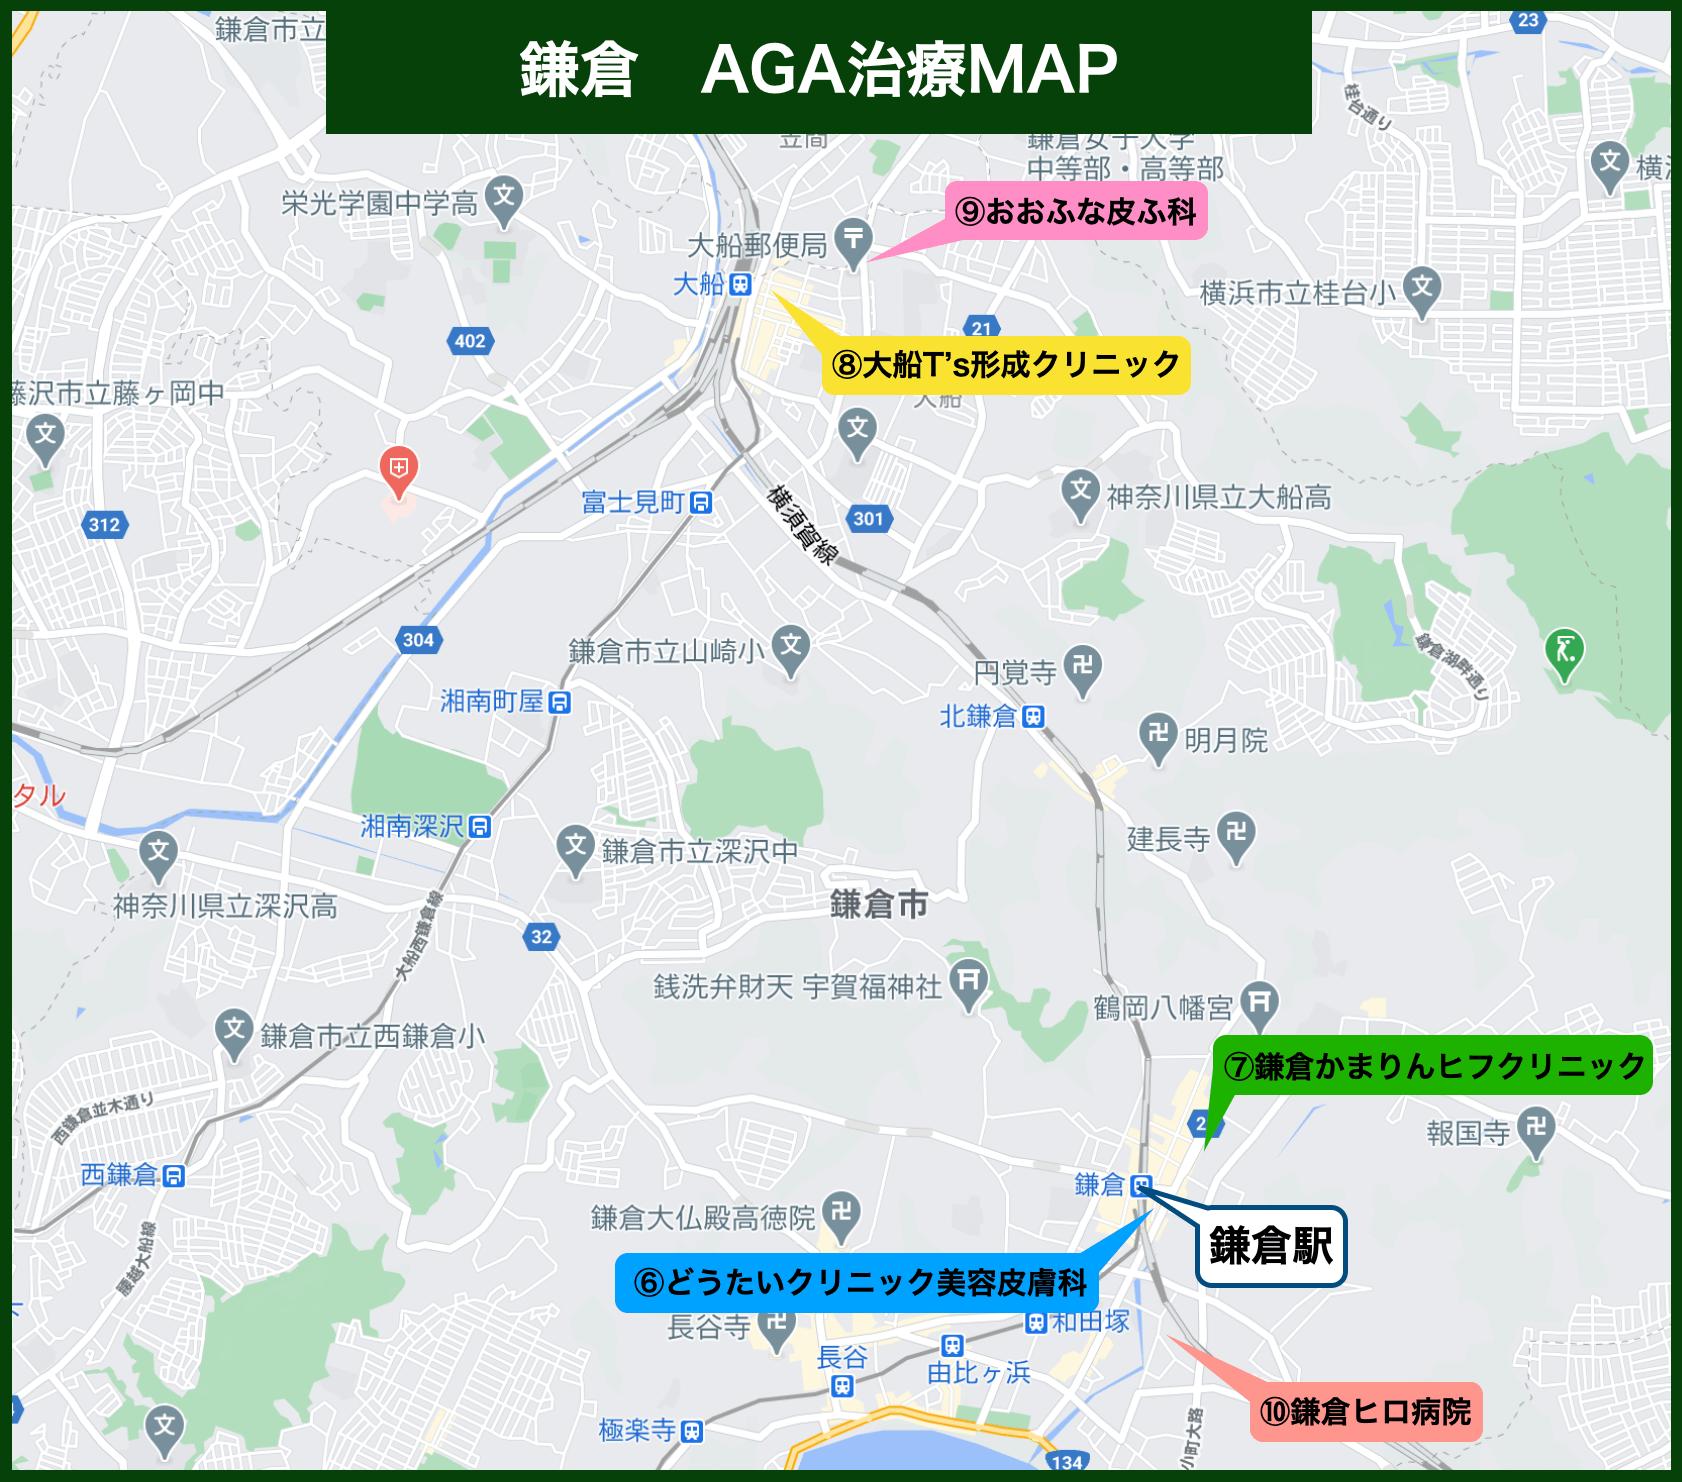 鎌倉 AGA治療MAP